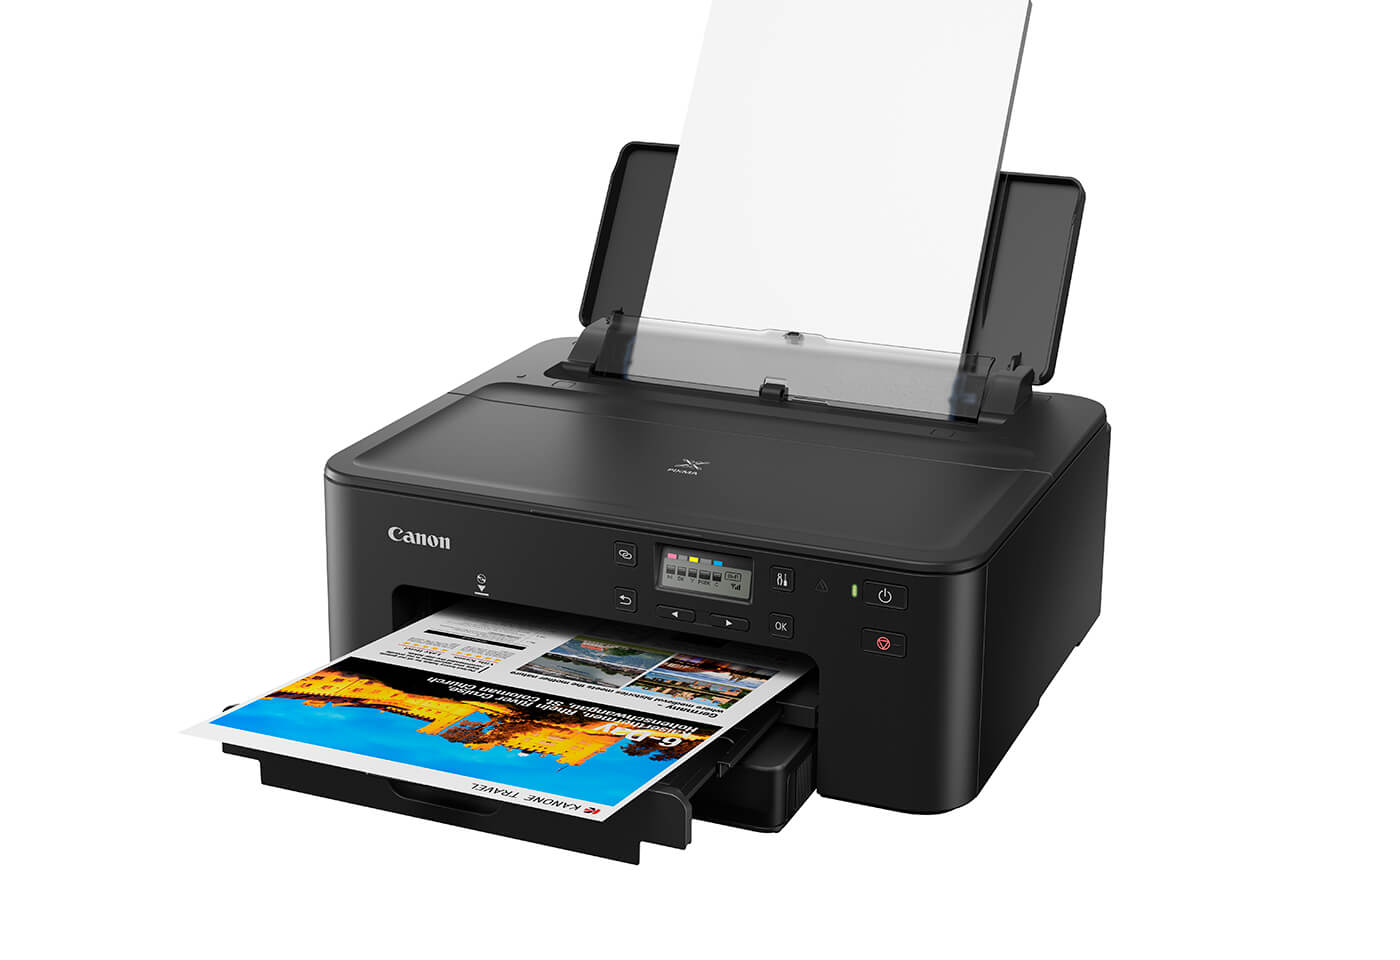 PIXMA TS706 product image